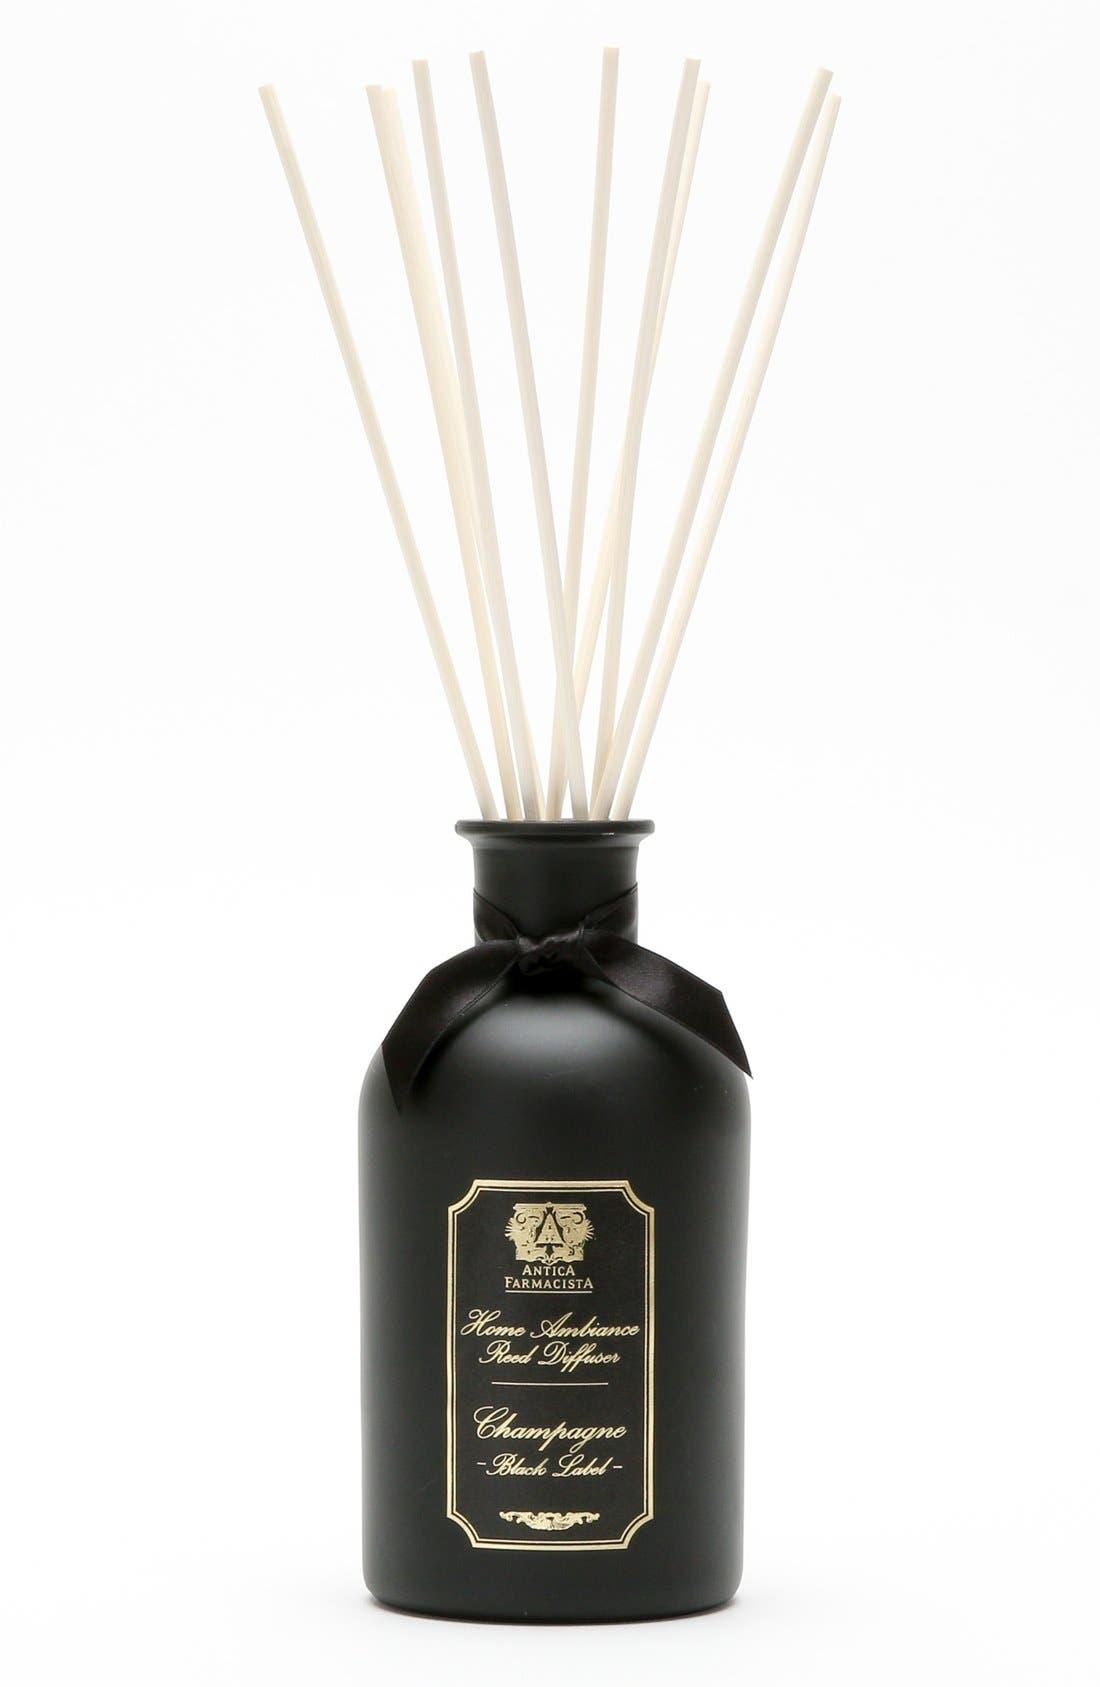 Antica Farmacista Black Label - Champagne Home Ambiance Perfume (Limited Edition)